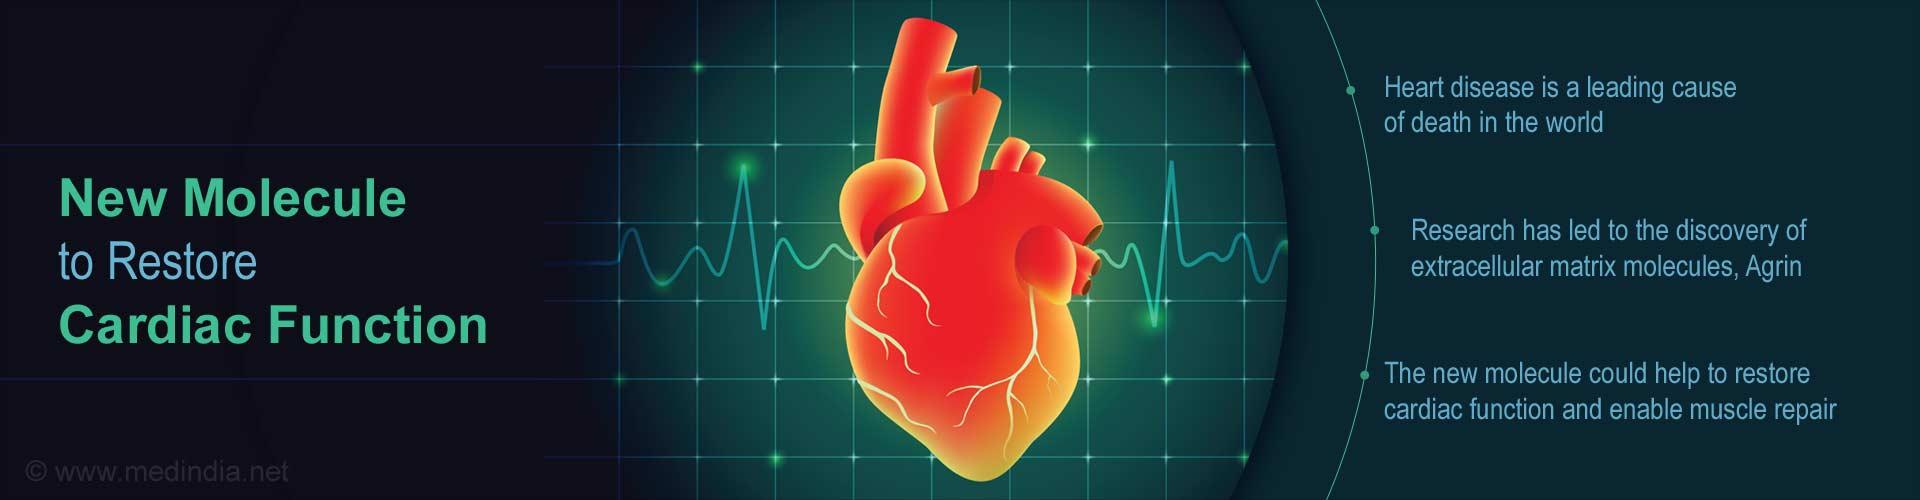 Novel Matrix Molecules Open Up Avenues to Restore Cardiac Function